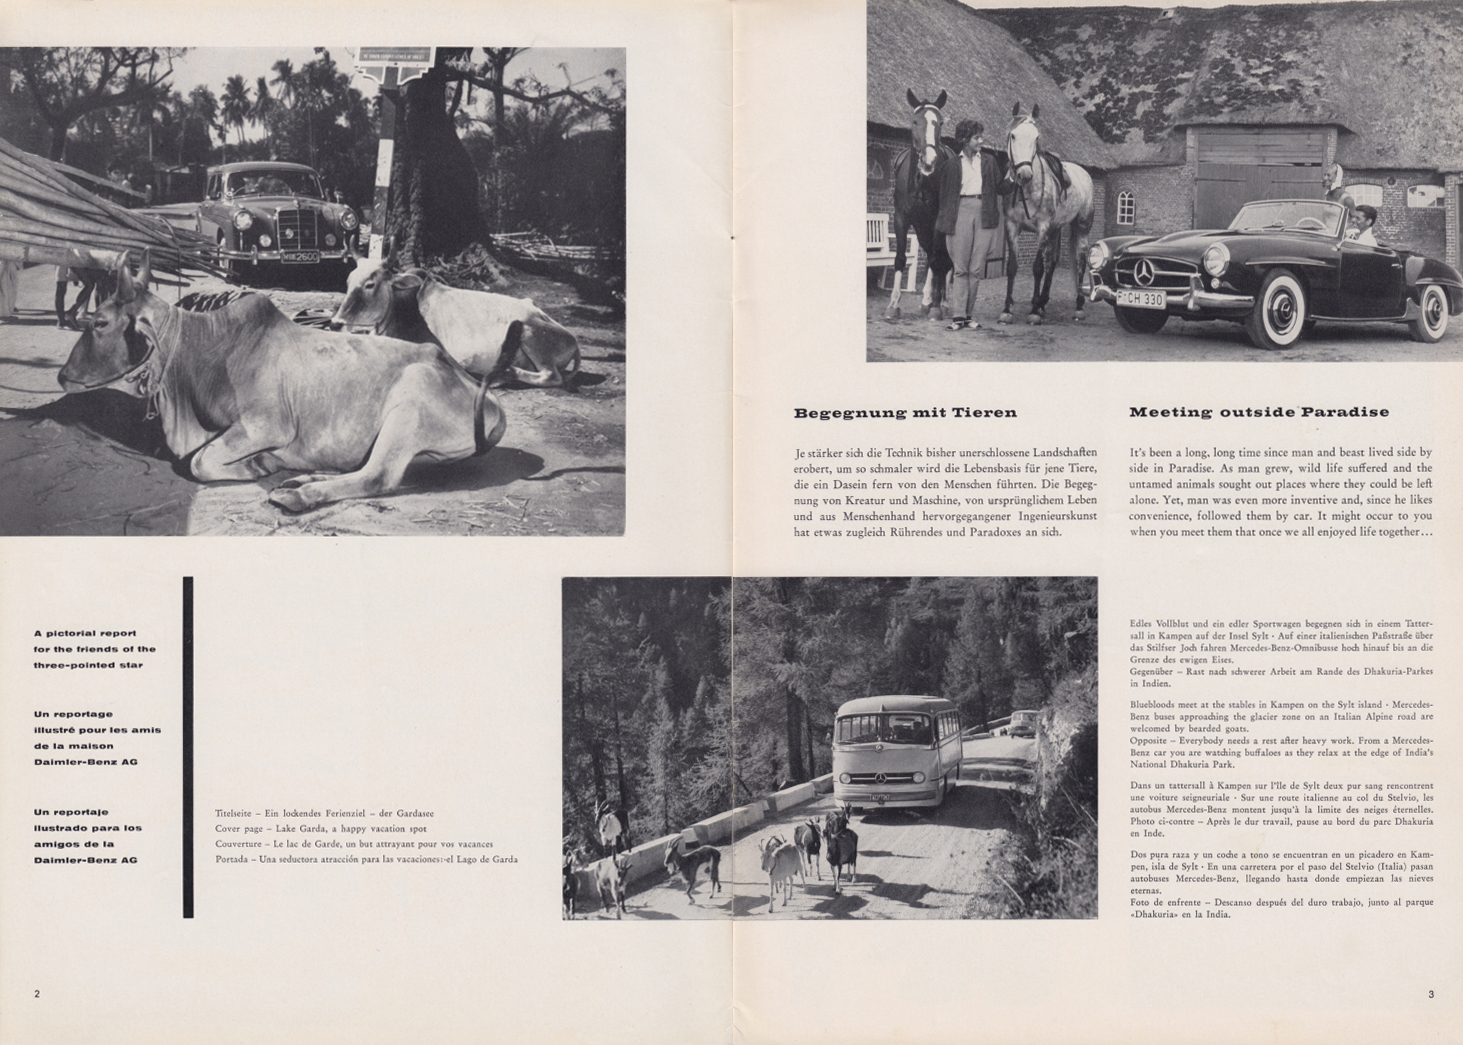 (REVISTA): Periódico In aller welt n.º 32 - Mercedes-Benz no mundo - 1959 - multilingue 002